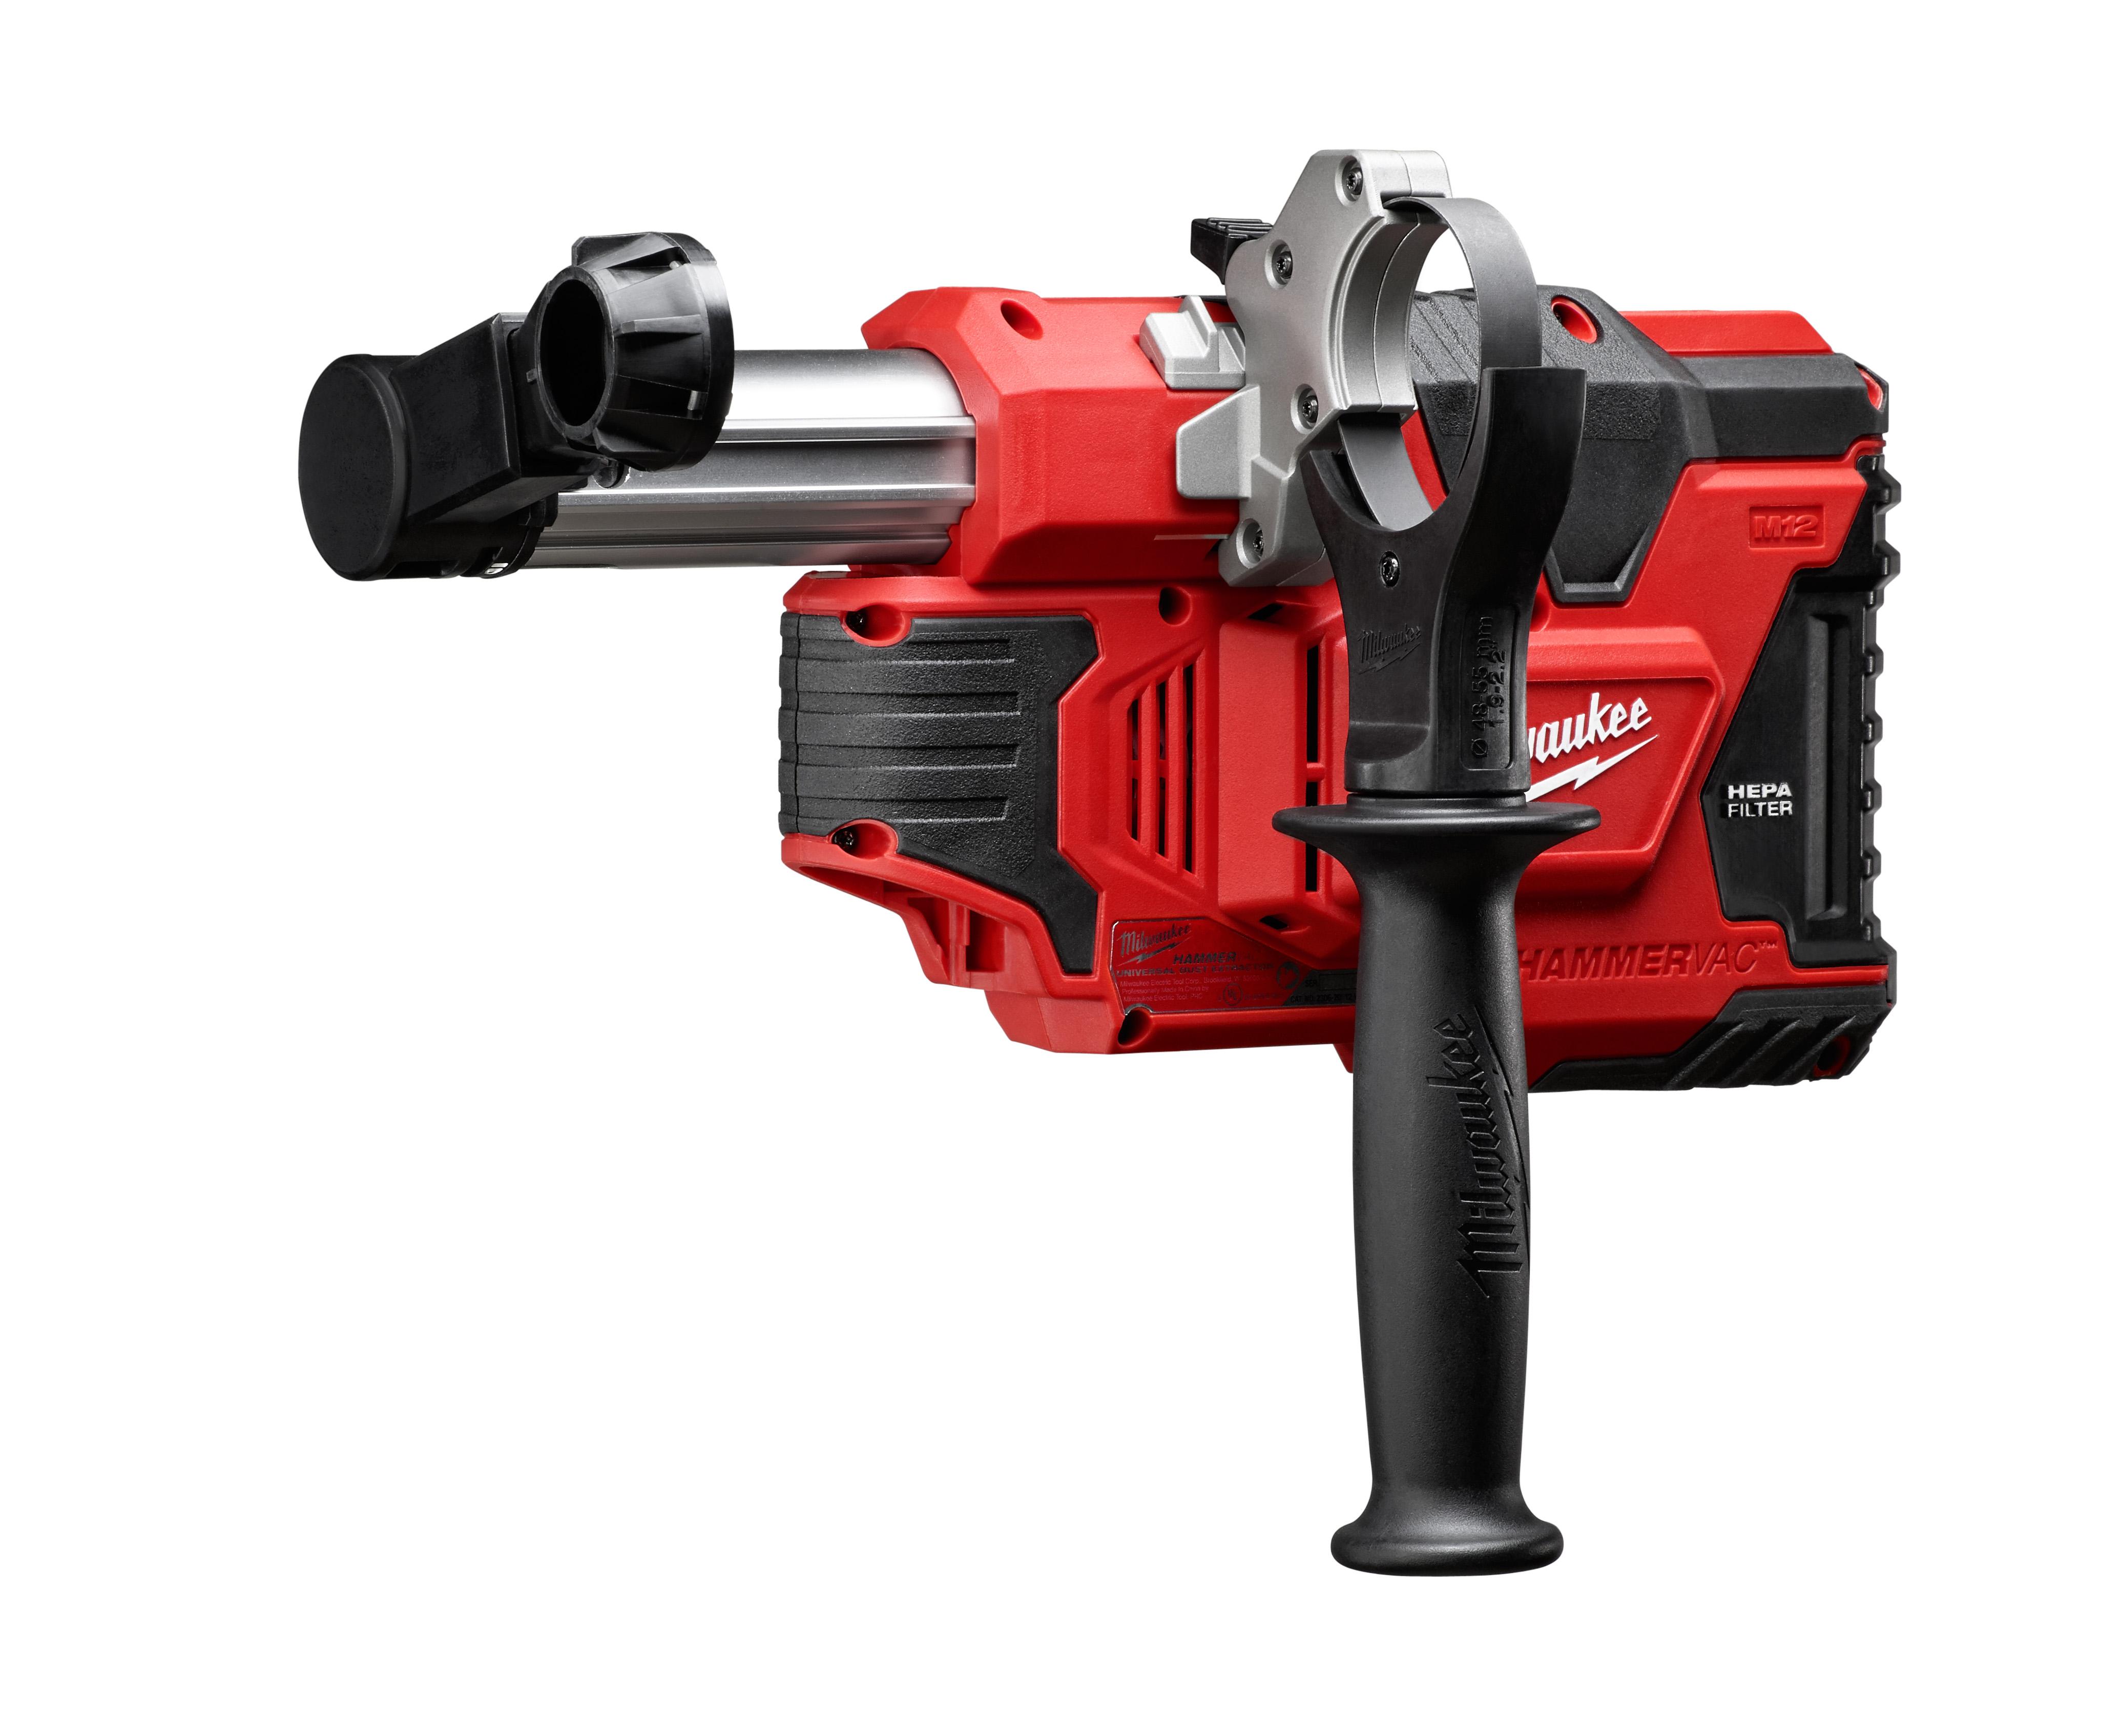 Milwaukee 2306-20 M12™ HAMMERVAC™ Dust Extractor